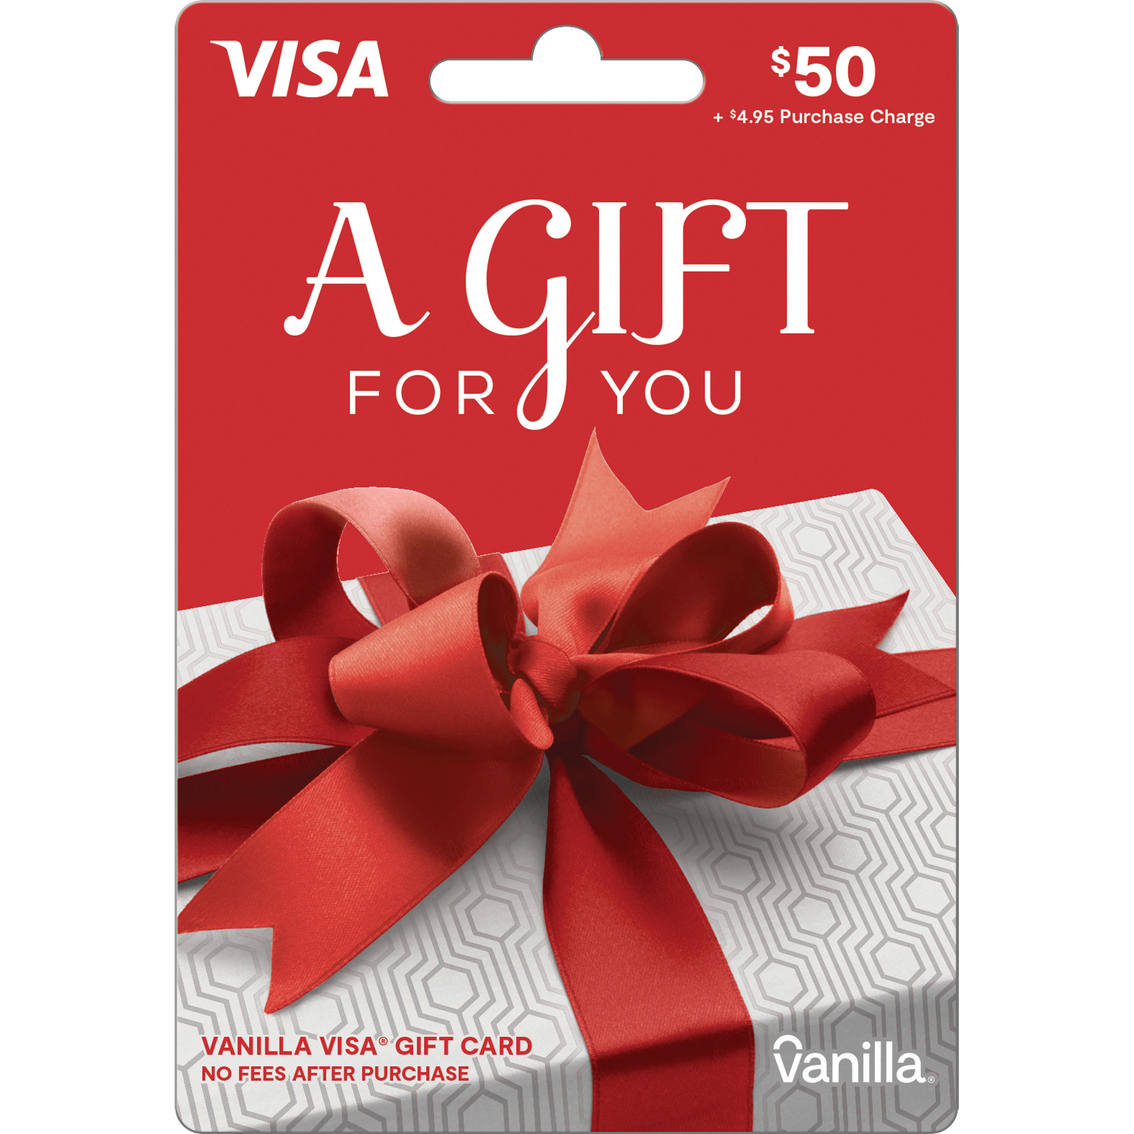 Vanilla Visa Metallic Pattern Gift Card Entertainment Dining Food Gifts Shop The Exchange